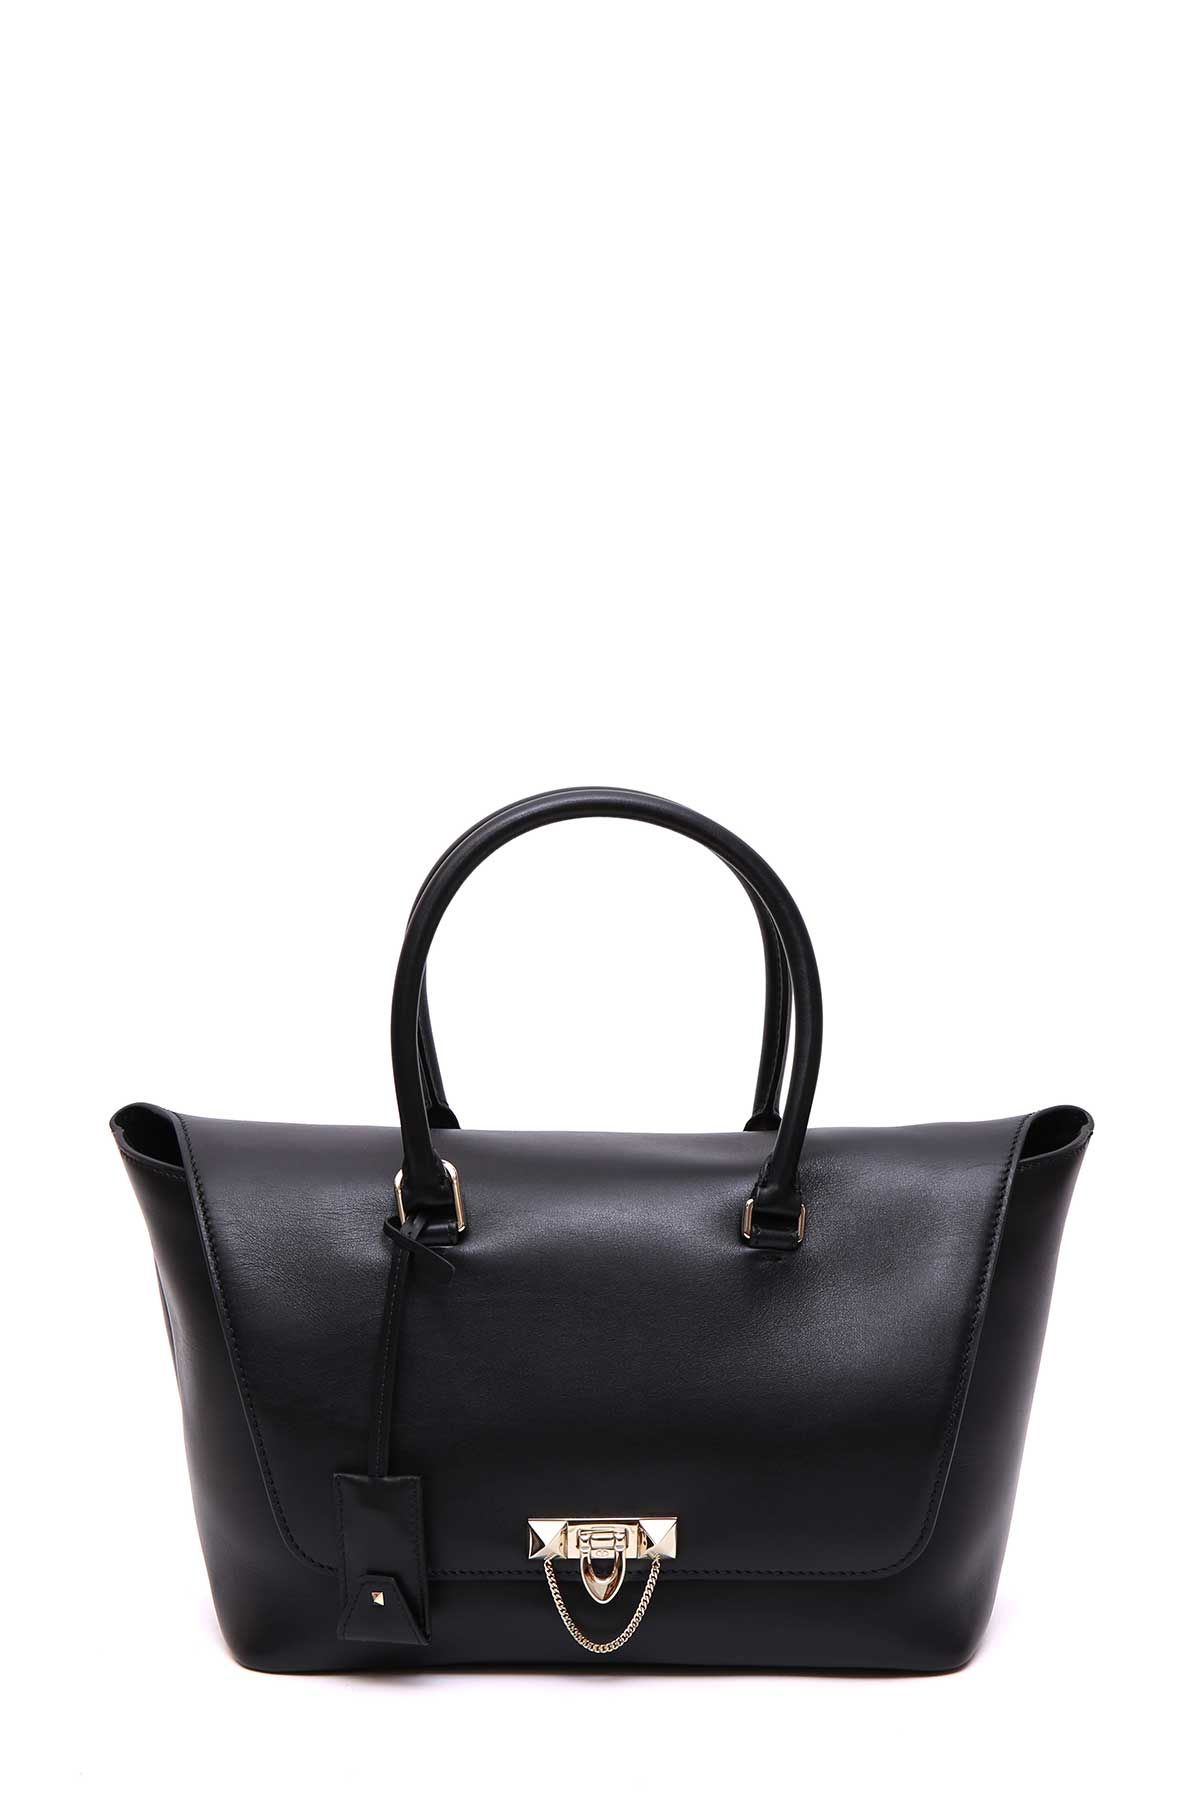 Valentino Garavani Demilune Handbag